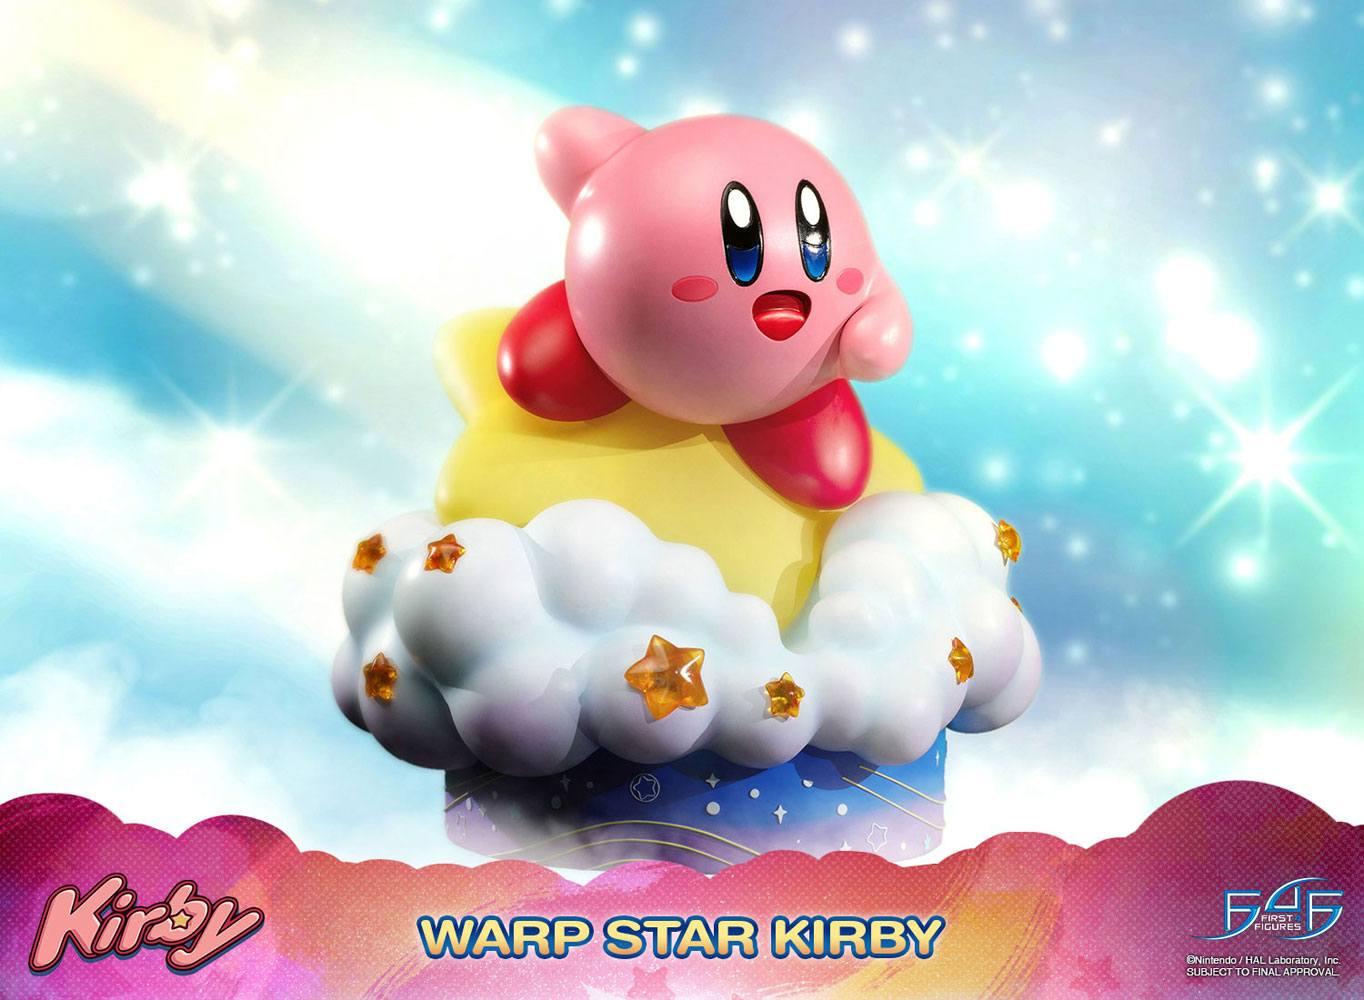 Kirby Statue Warp Star Kirby 30 cm